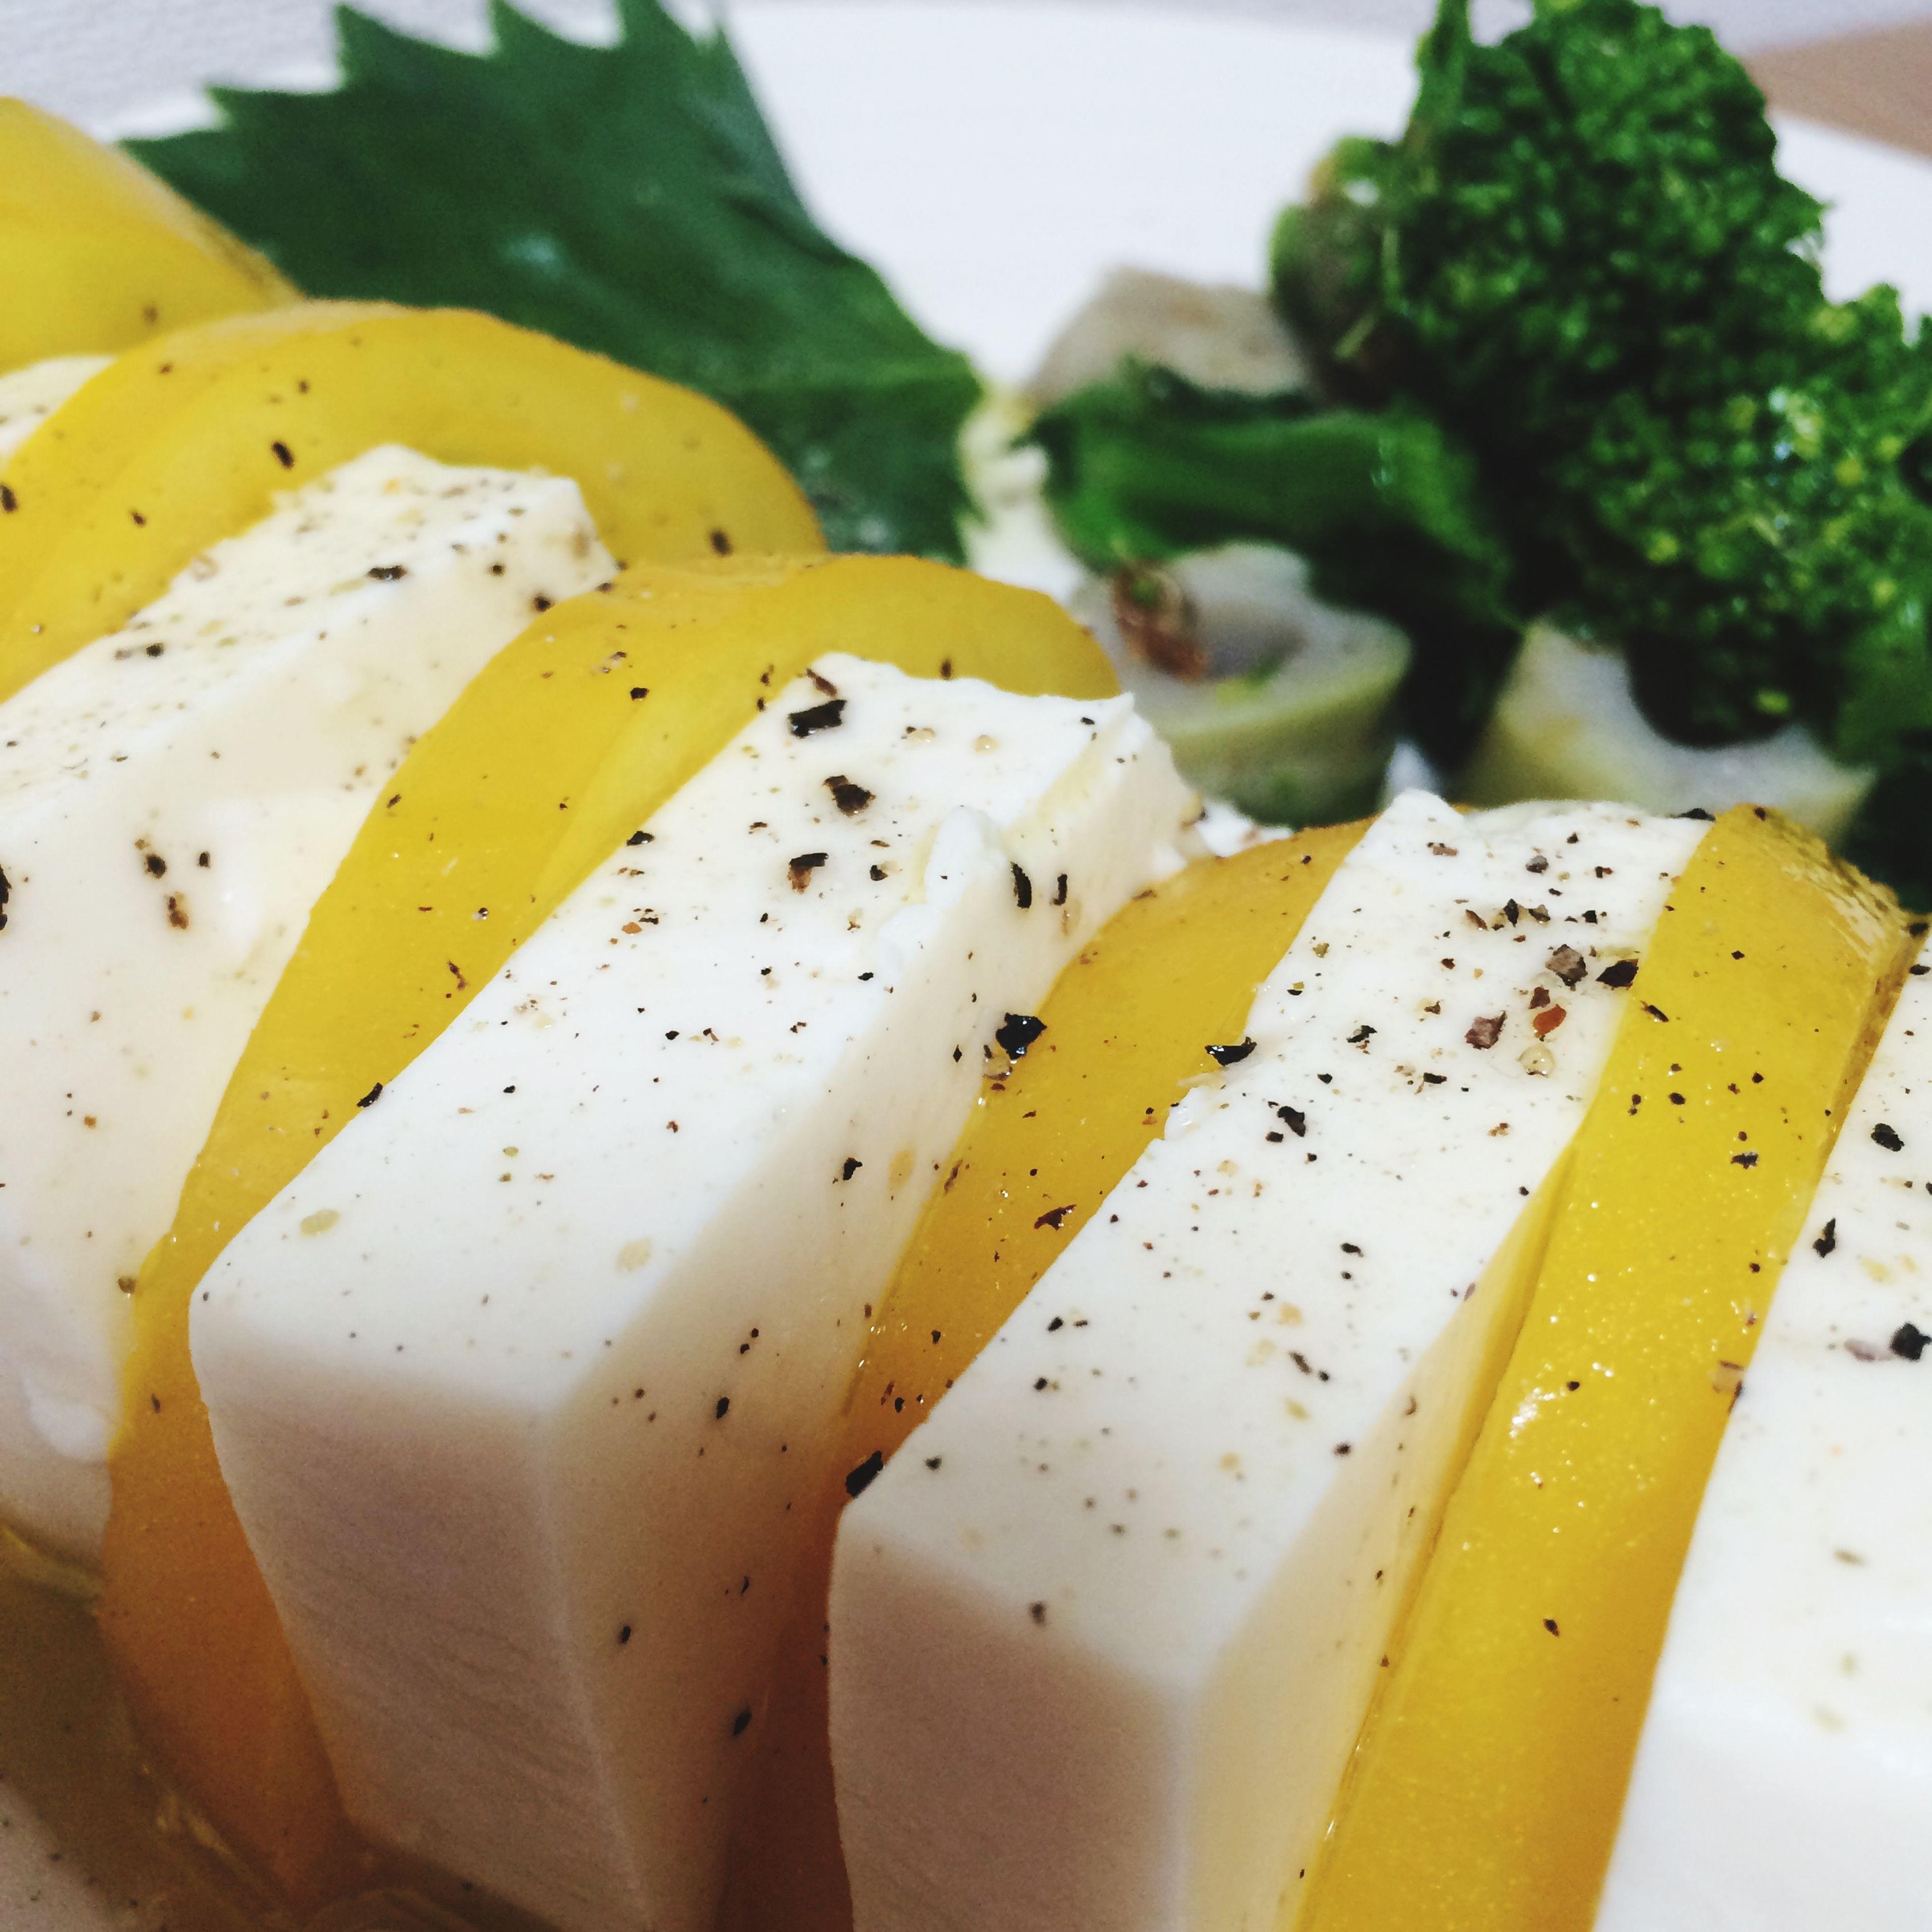 Lemon Boy Tomato Tofu トマト 豆腐 レモンボーイ カプレーゼ Caprese